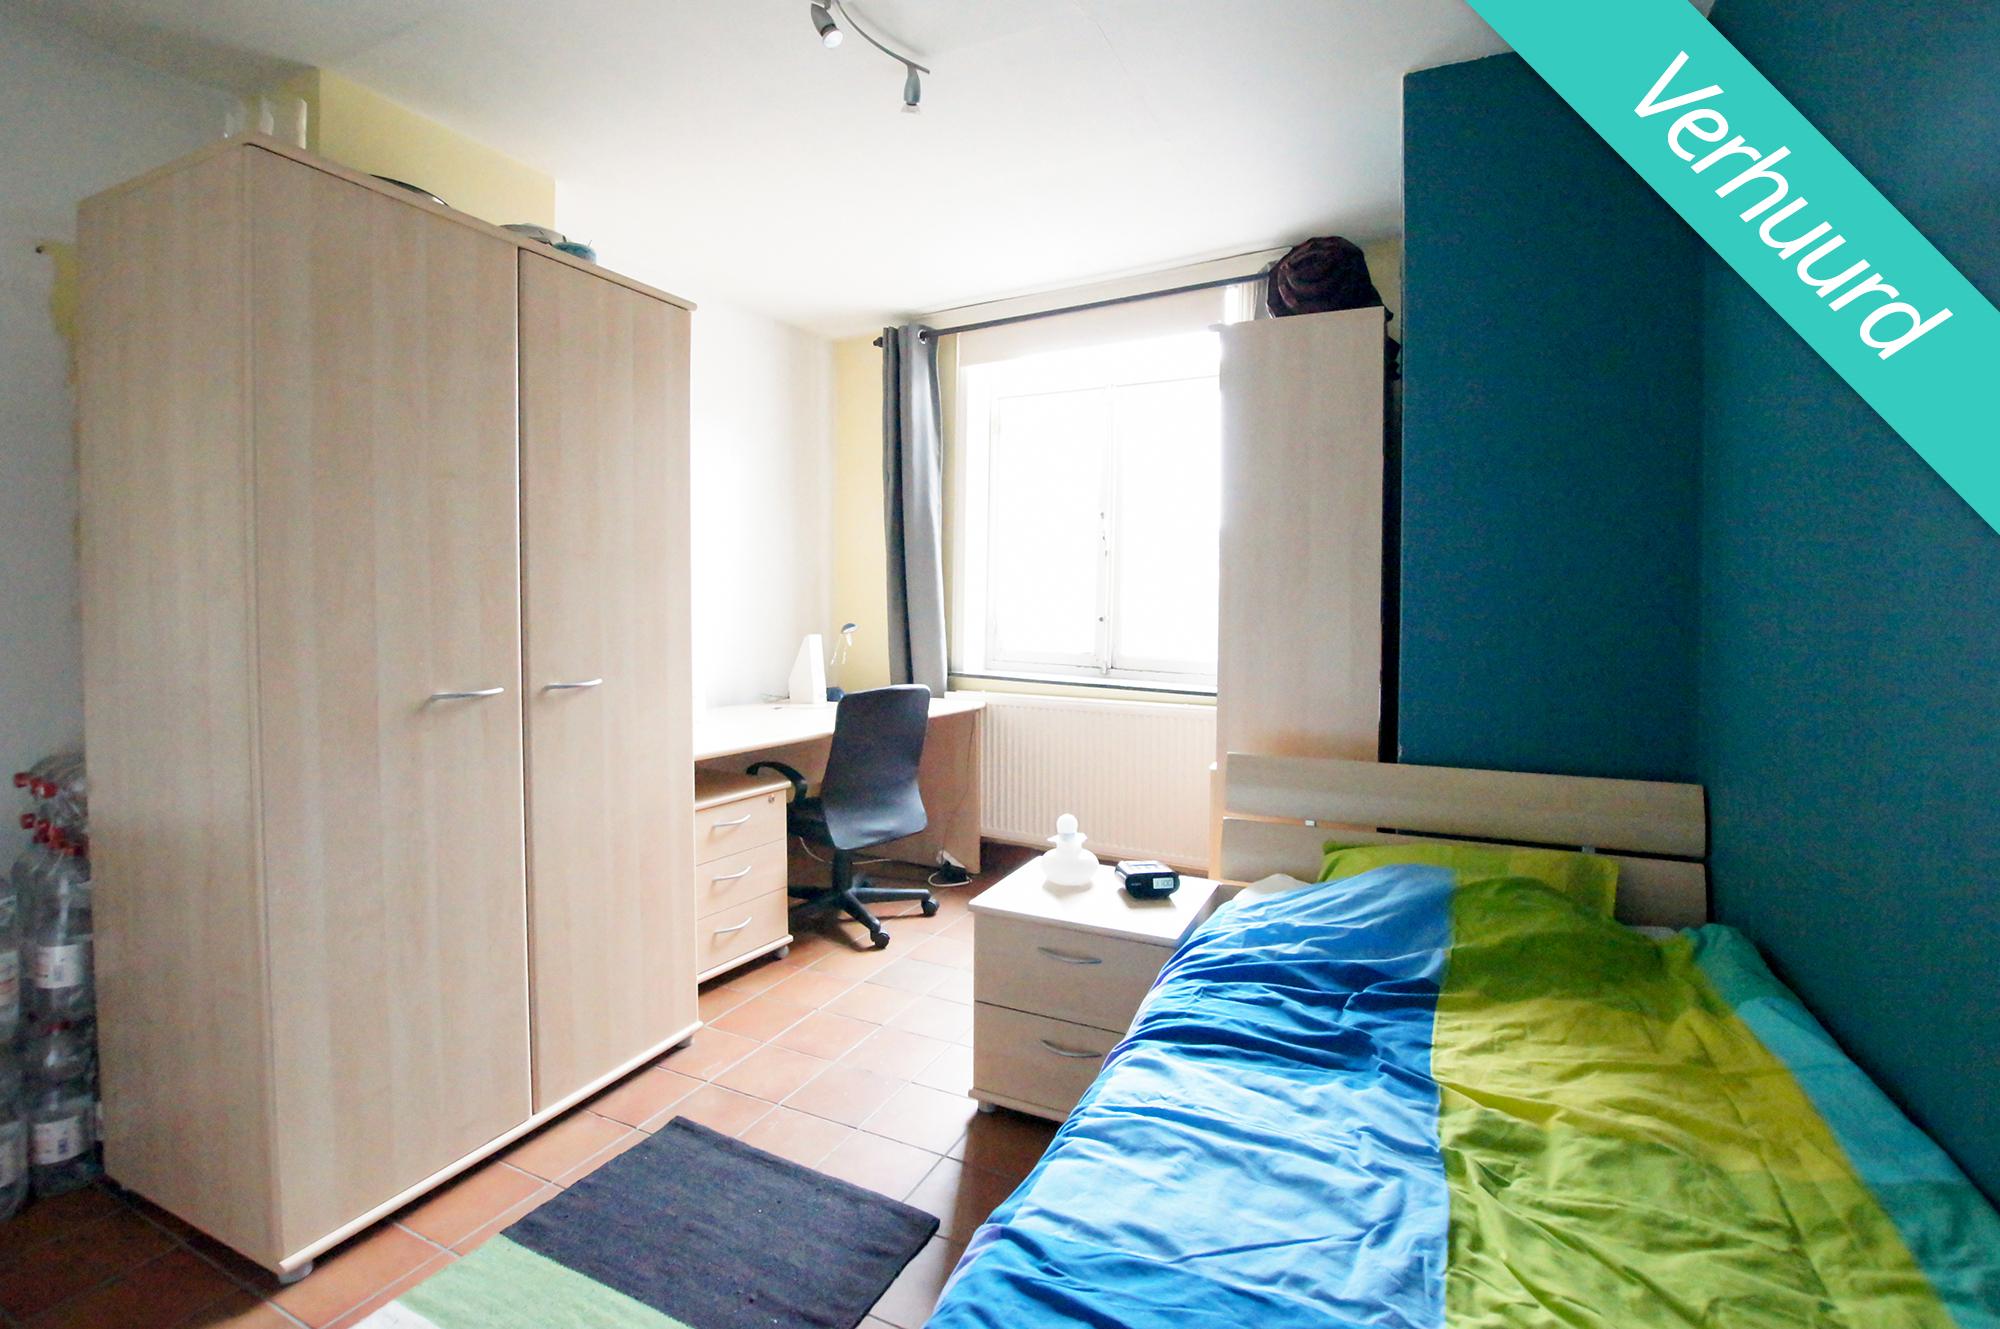 Edward van evenstraat 10 12 kamer 4 koten leuven - Kamer van water m ...